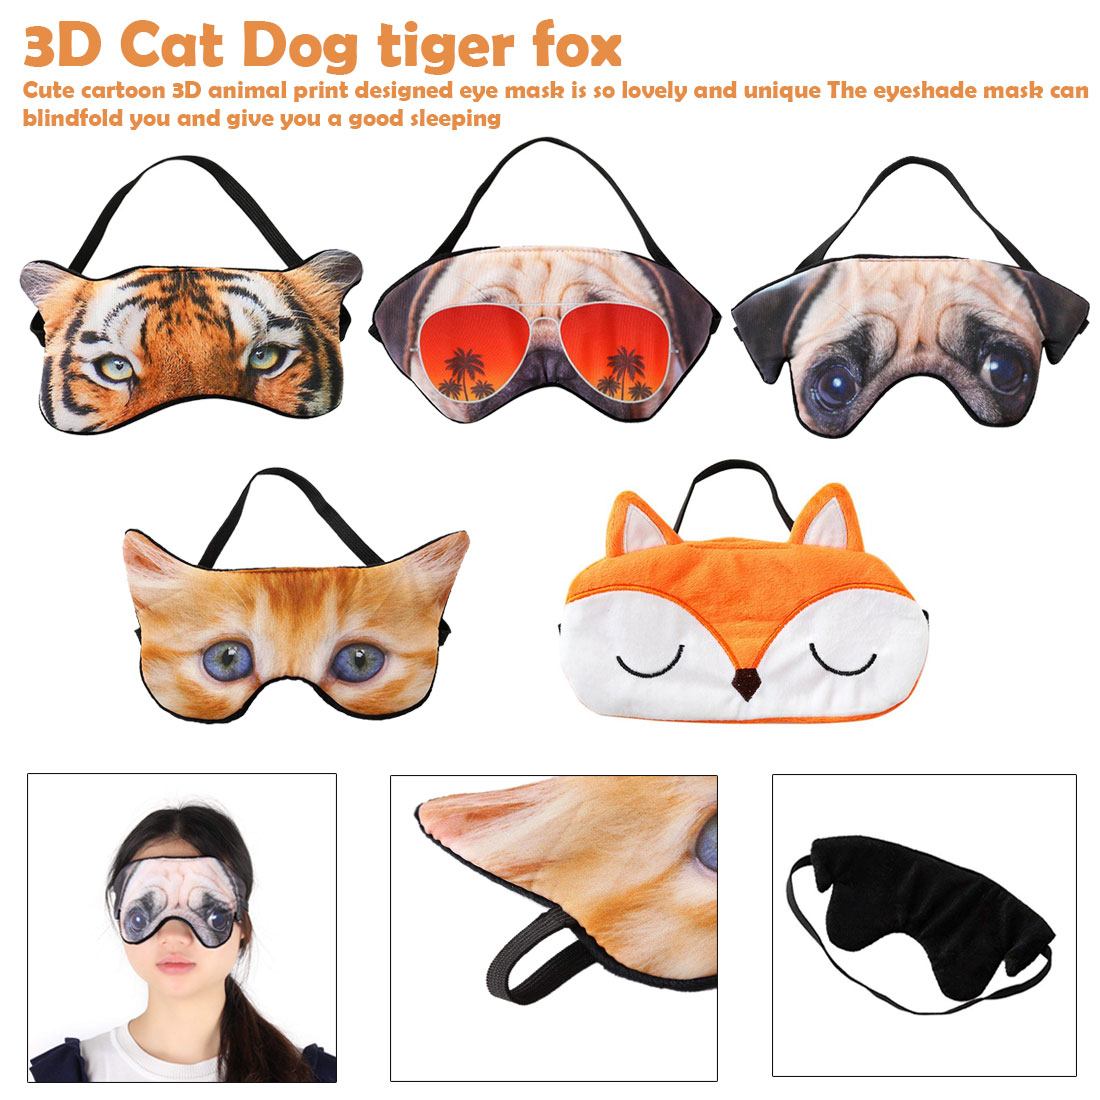 3D Cat Dog Eyes Mask Eyeshade Shading Cute Tiger Fox Sleeping Mask Eye Cover For Travel Relax Aid Blindfold Shades Party Masks